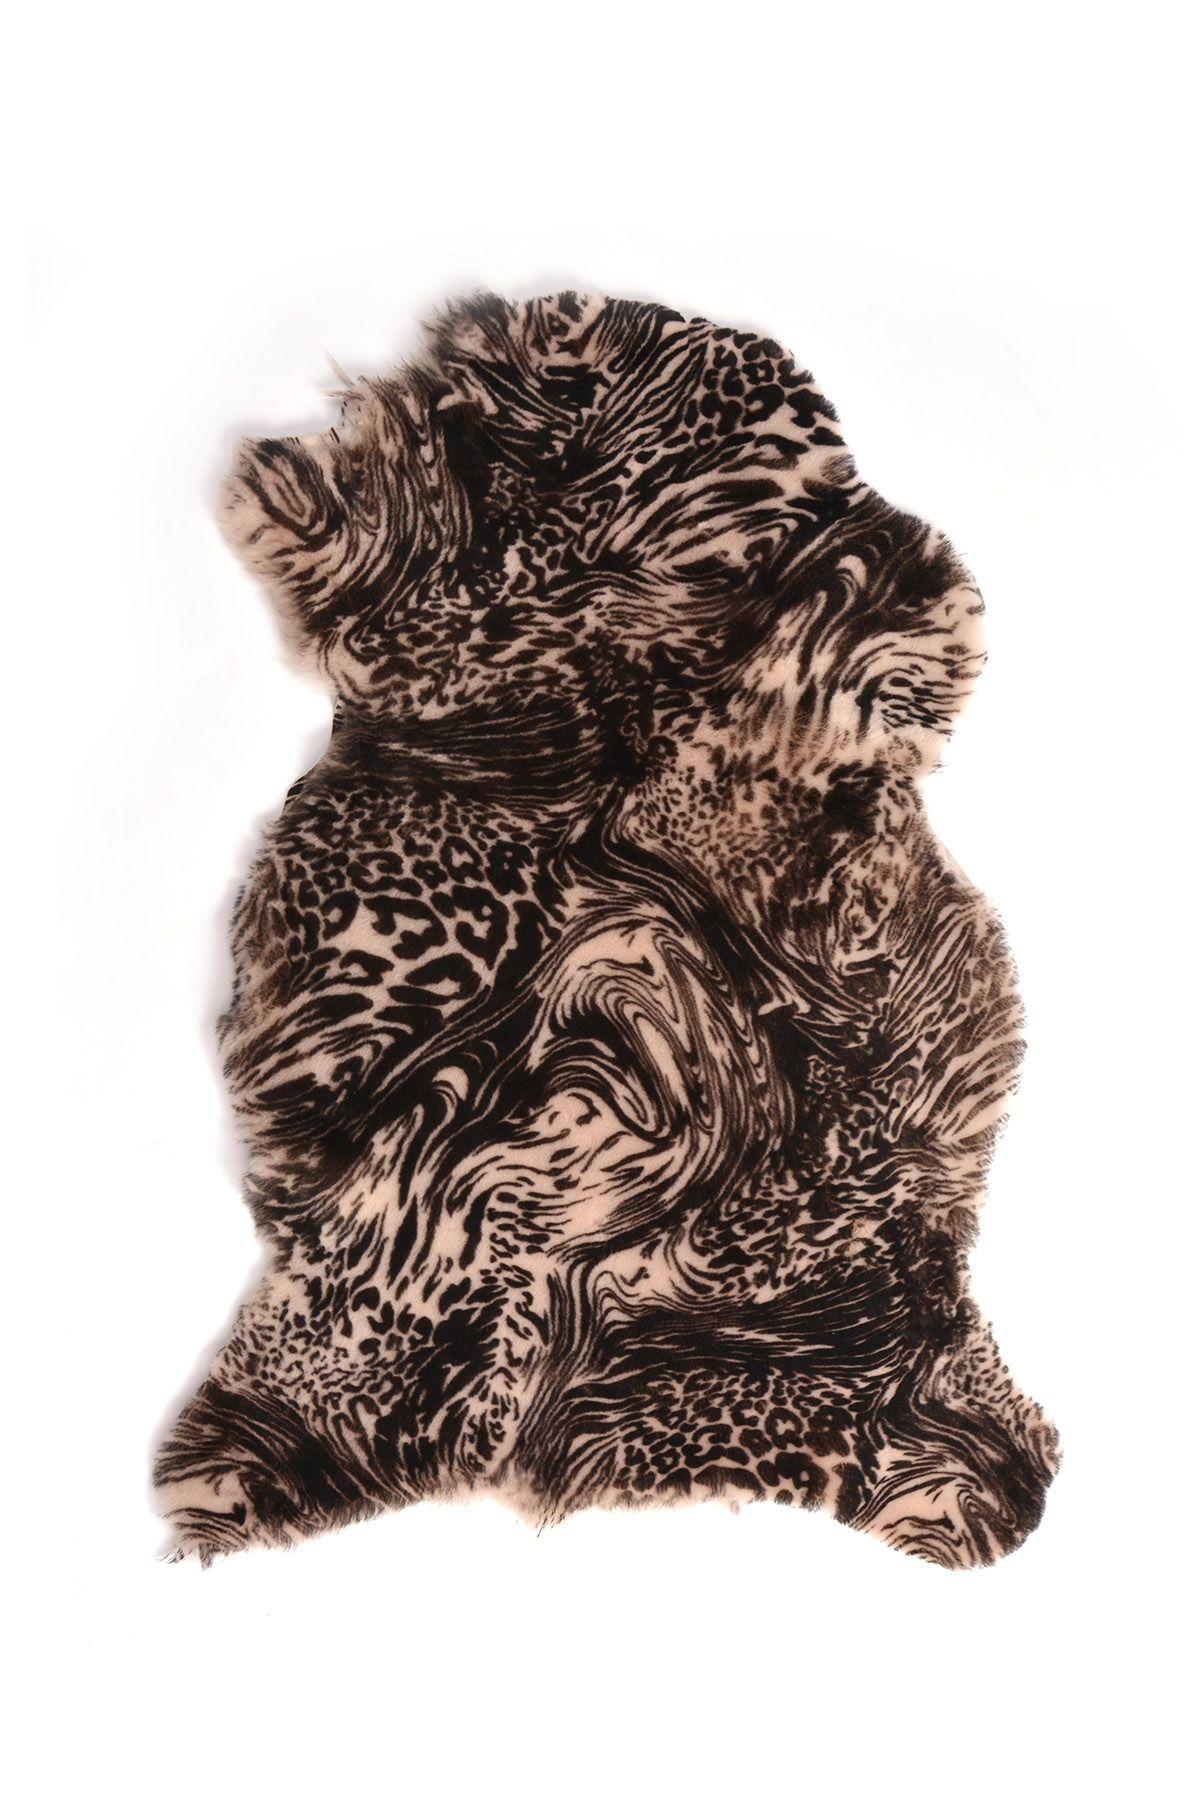 Erdogan Deri Patterned Decorative Sheepskin Rug Natural